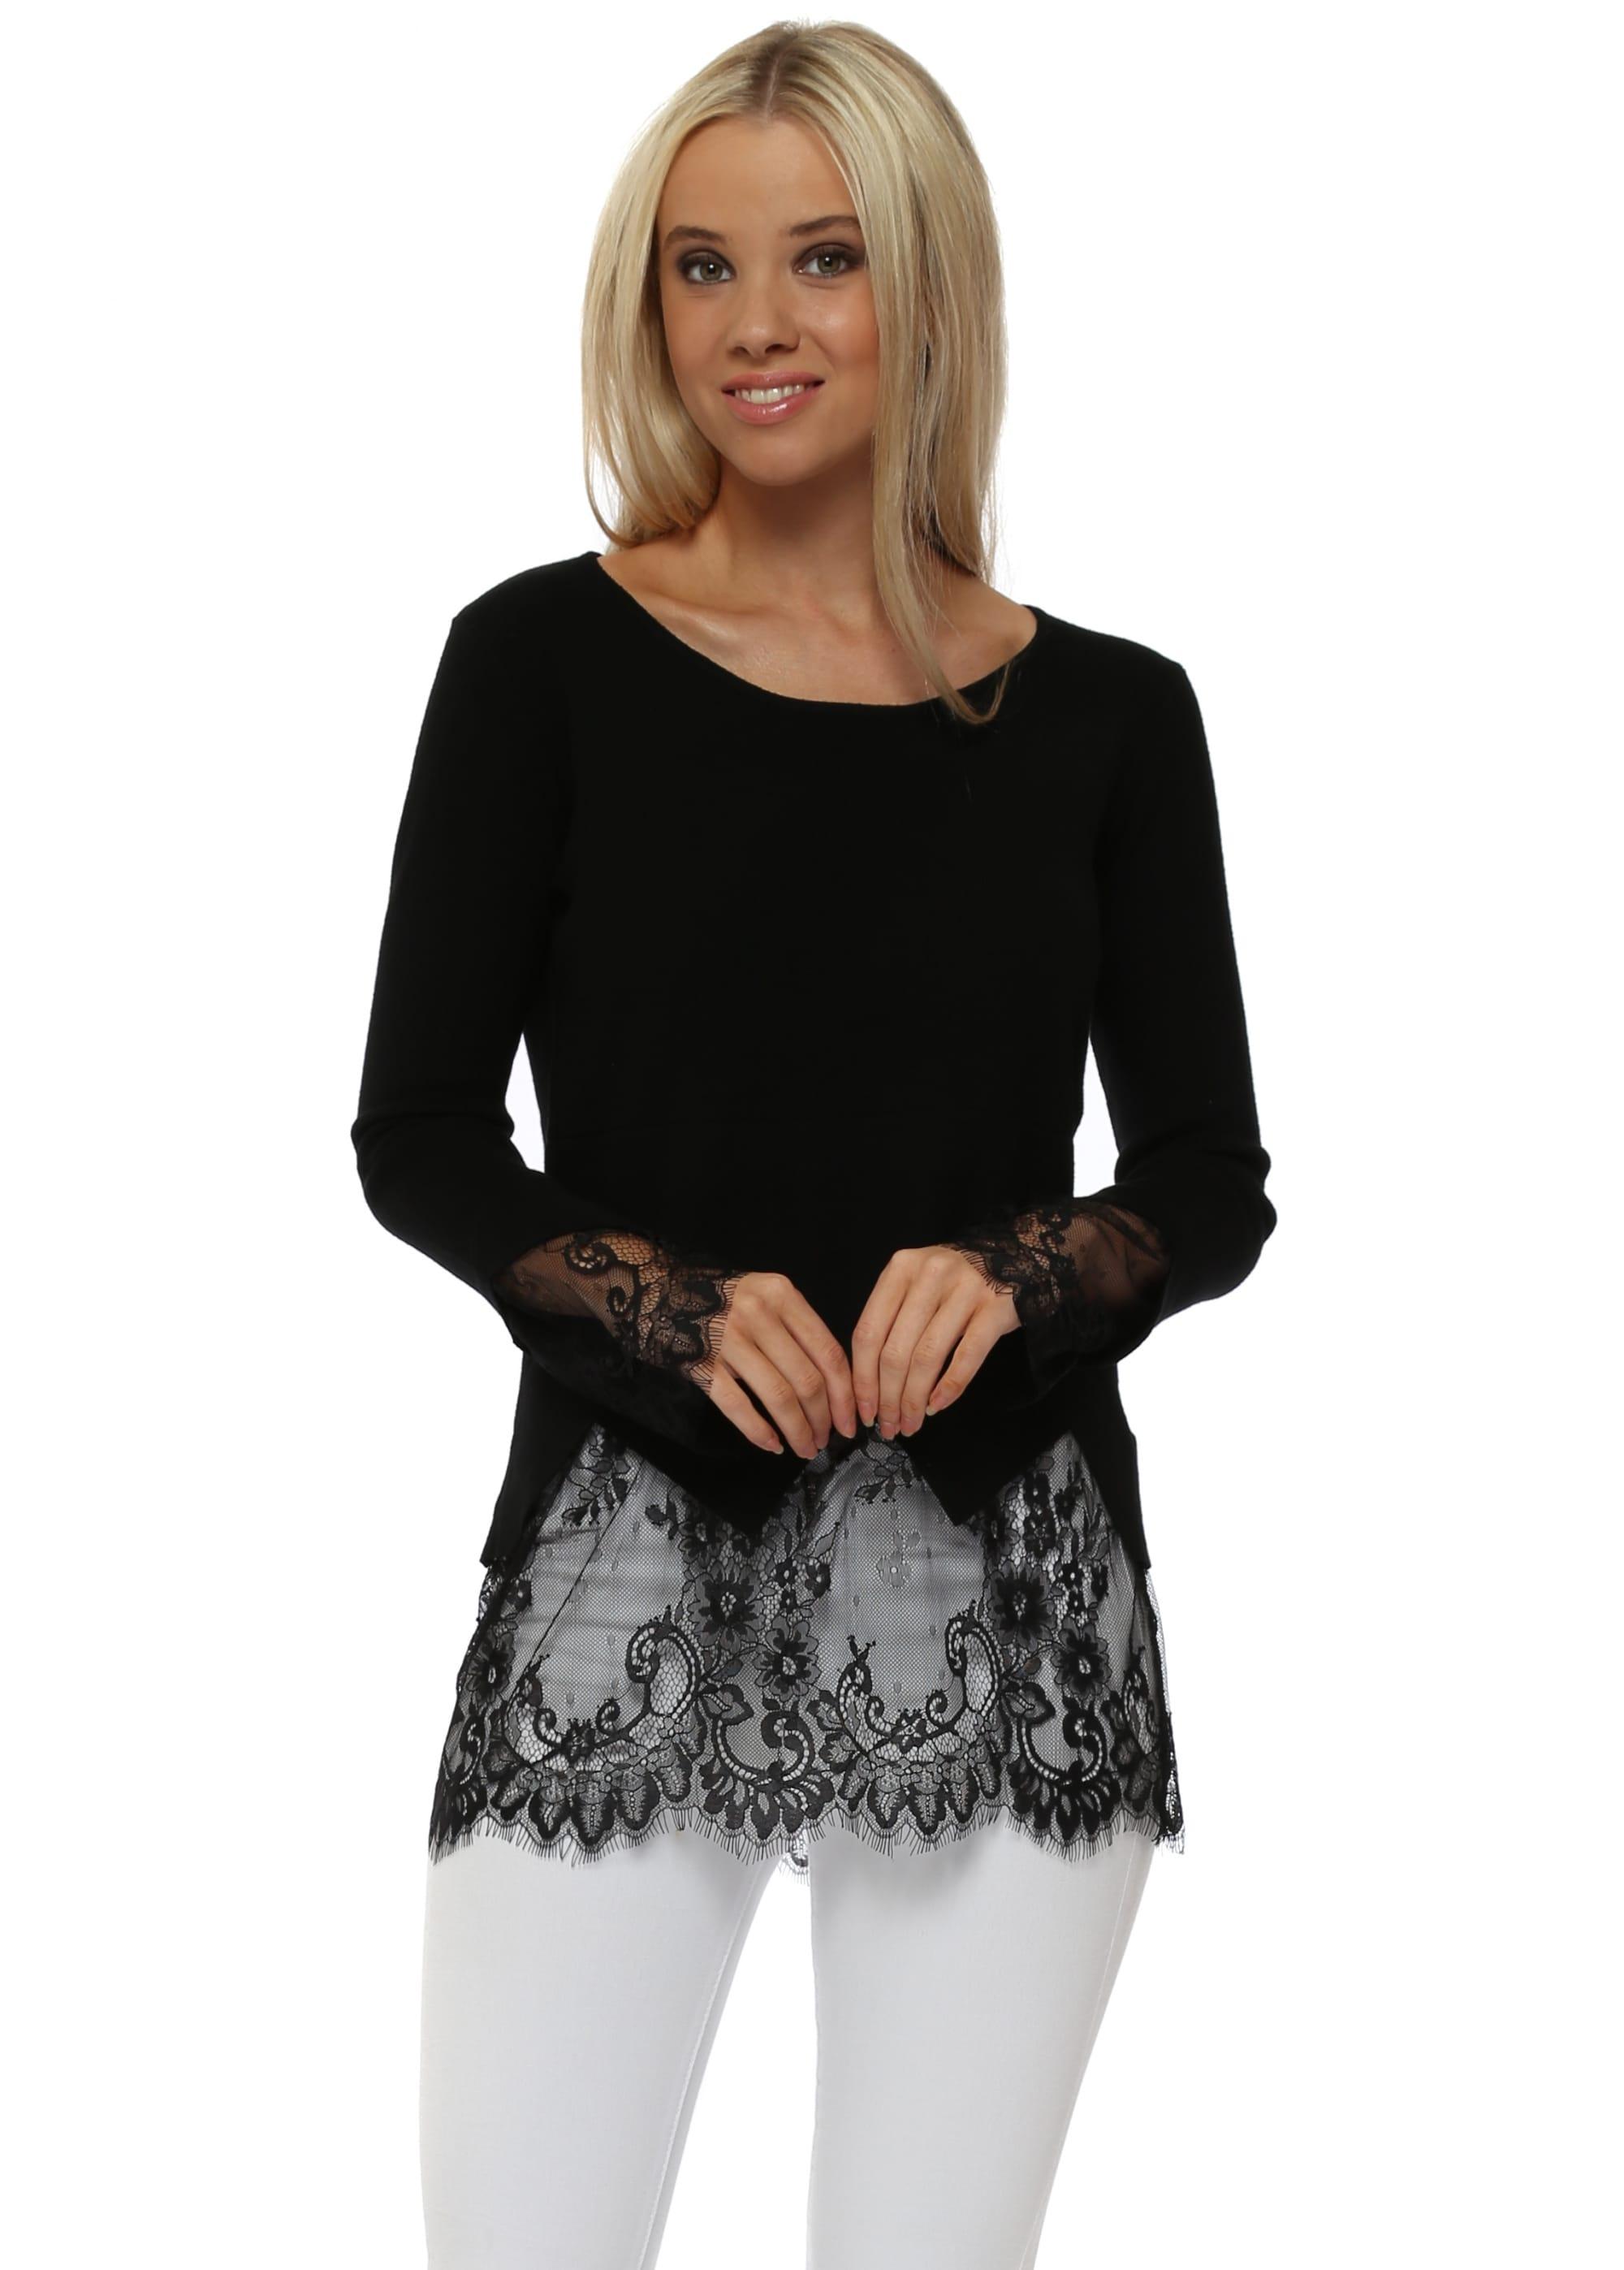 e26f12b8aaf Laetitia Mem Black Lace Jumper